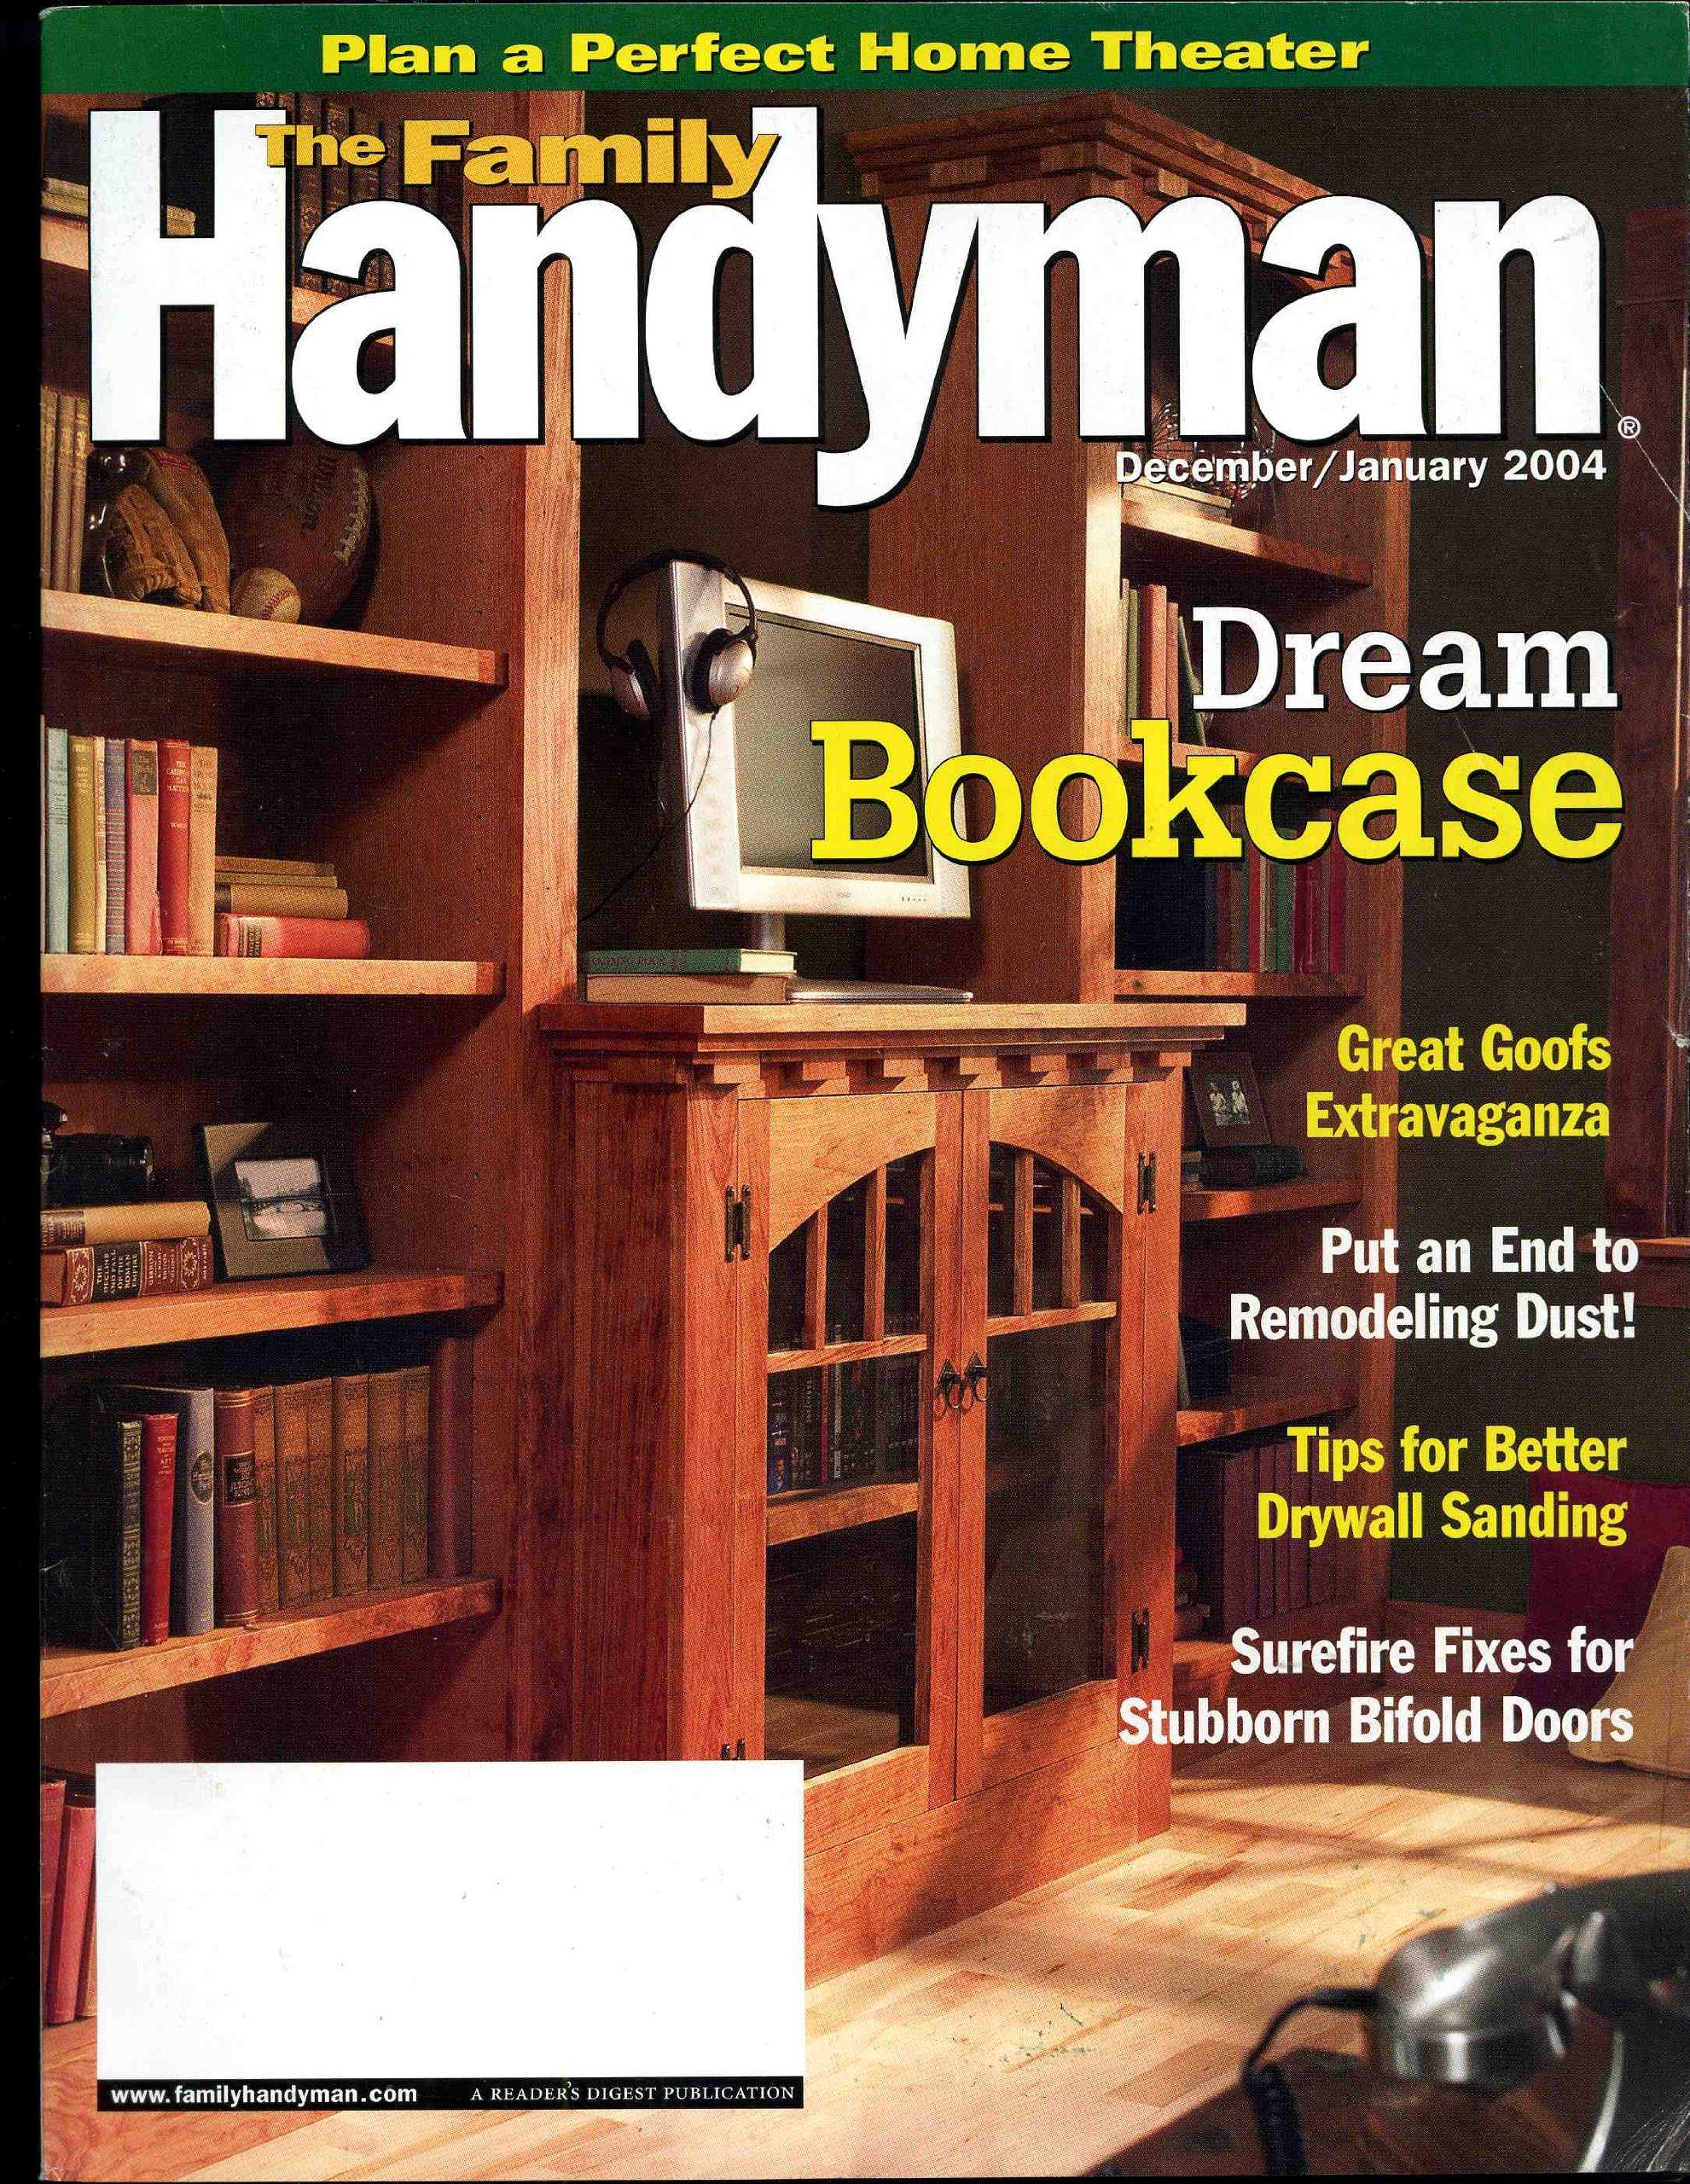 The Family Handyman Magazine December January 2004 Dream